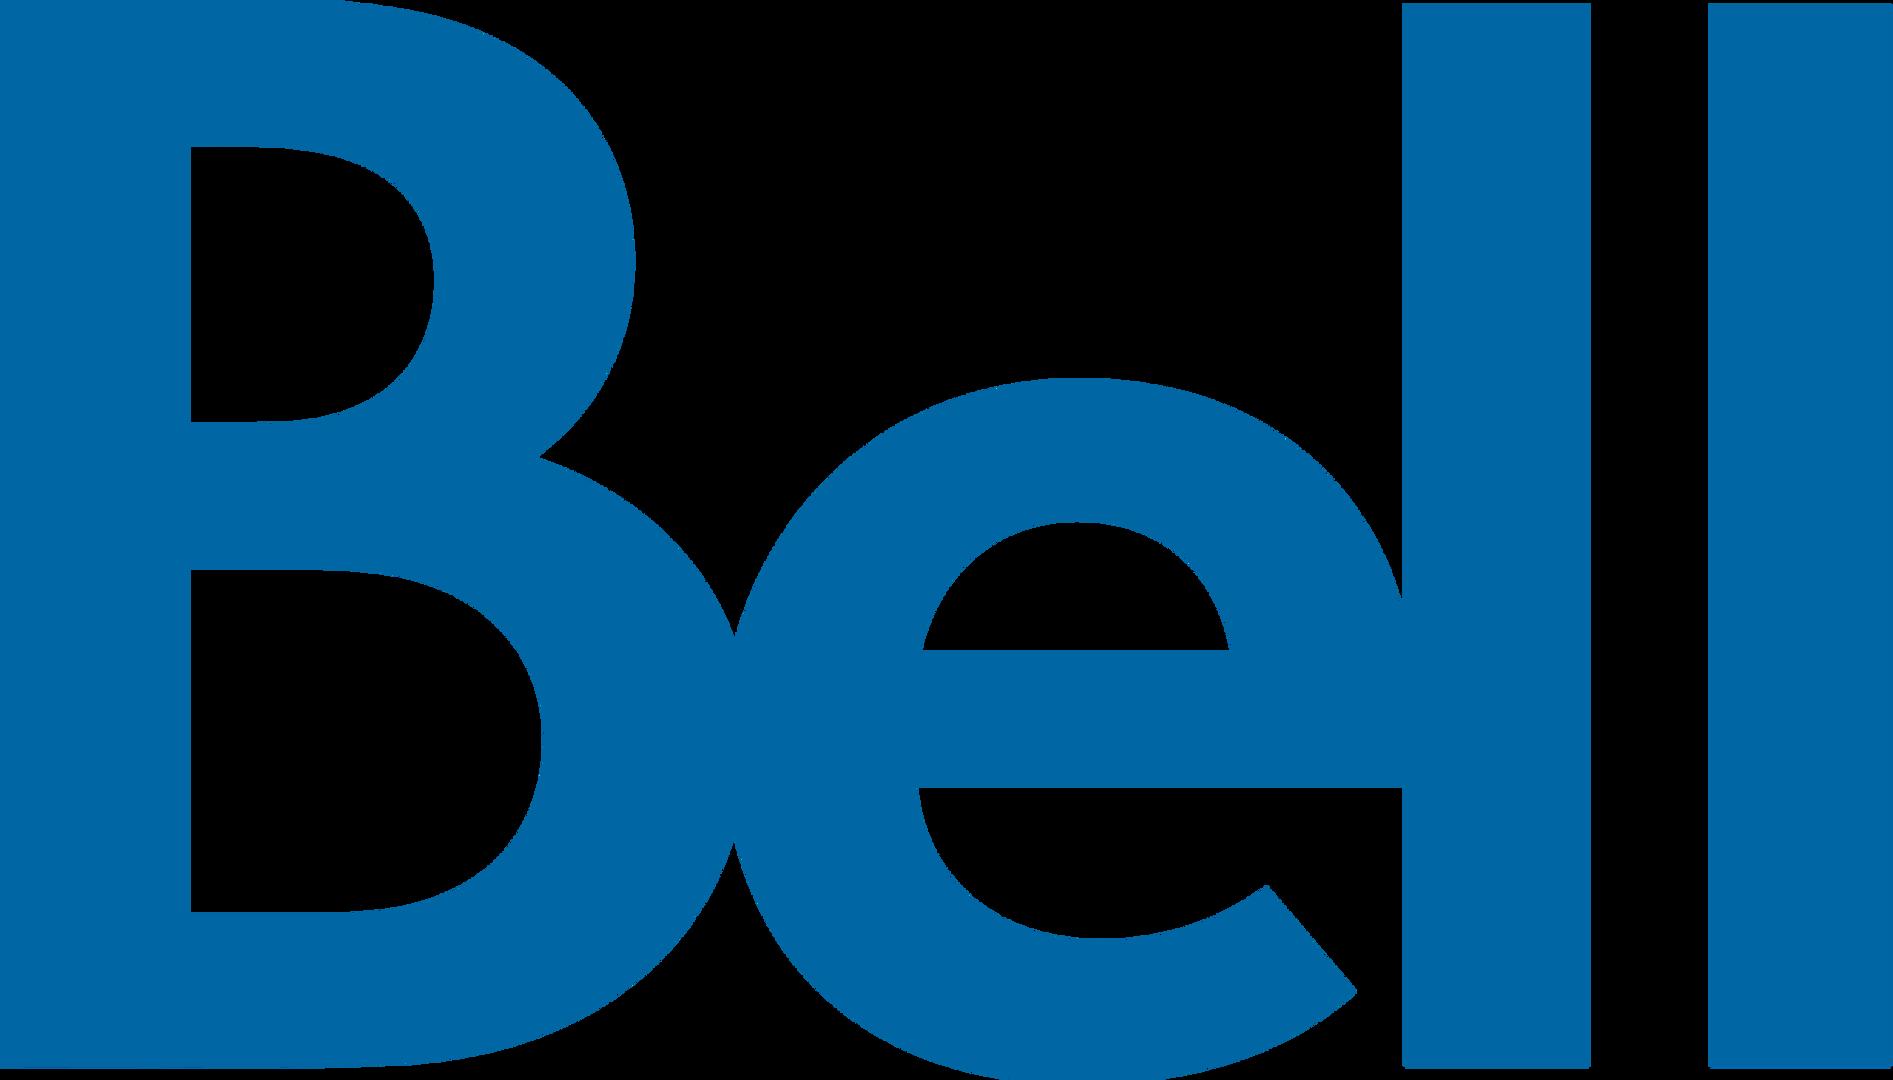 2560px-Bell_logo.svg.png